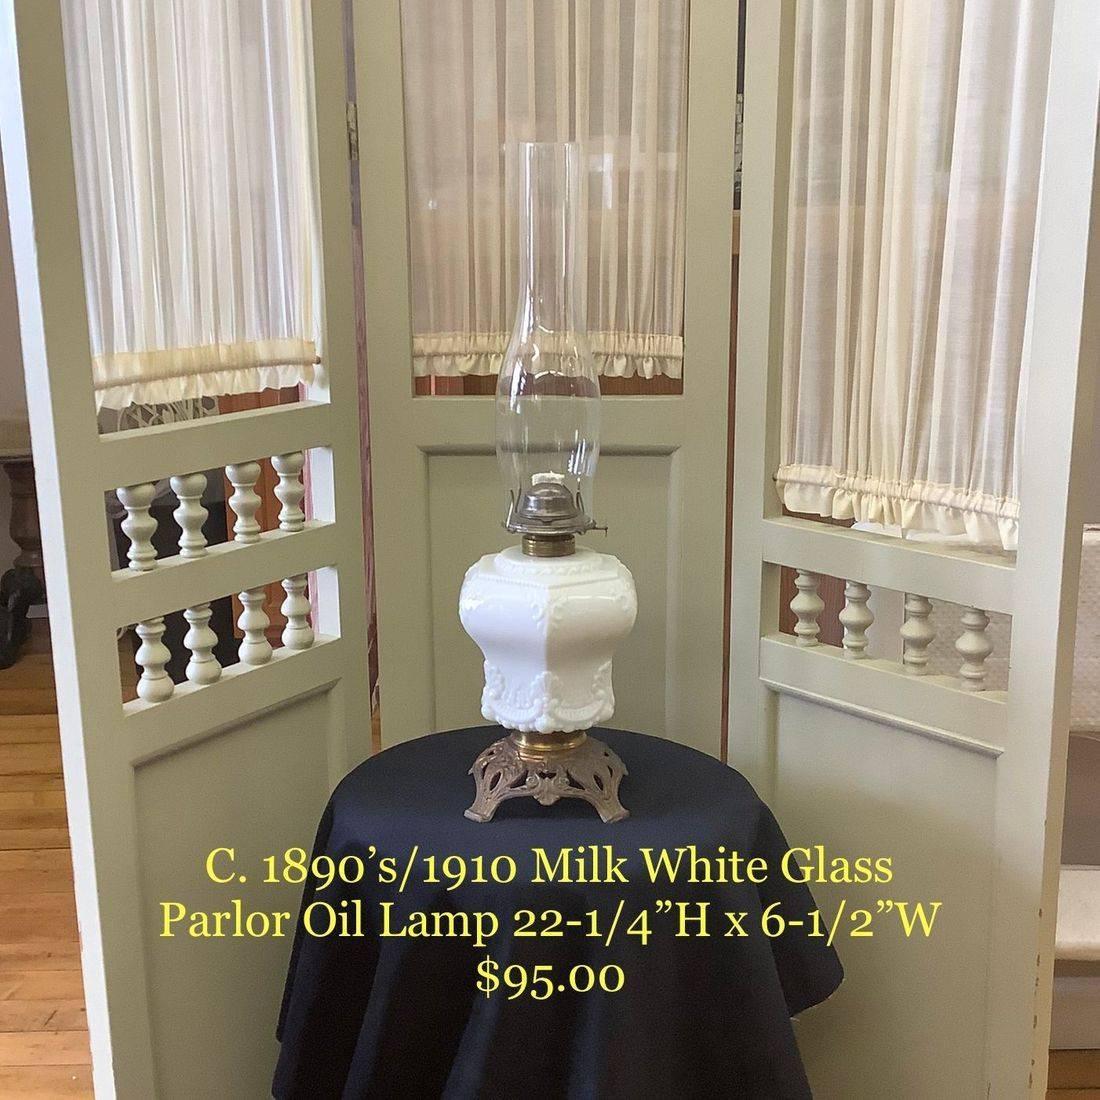 C. 1890's/1910  Milk White Glass, Parlor Oil Lamp   $95.00